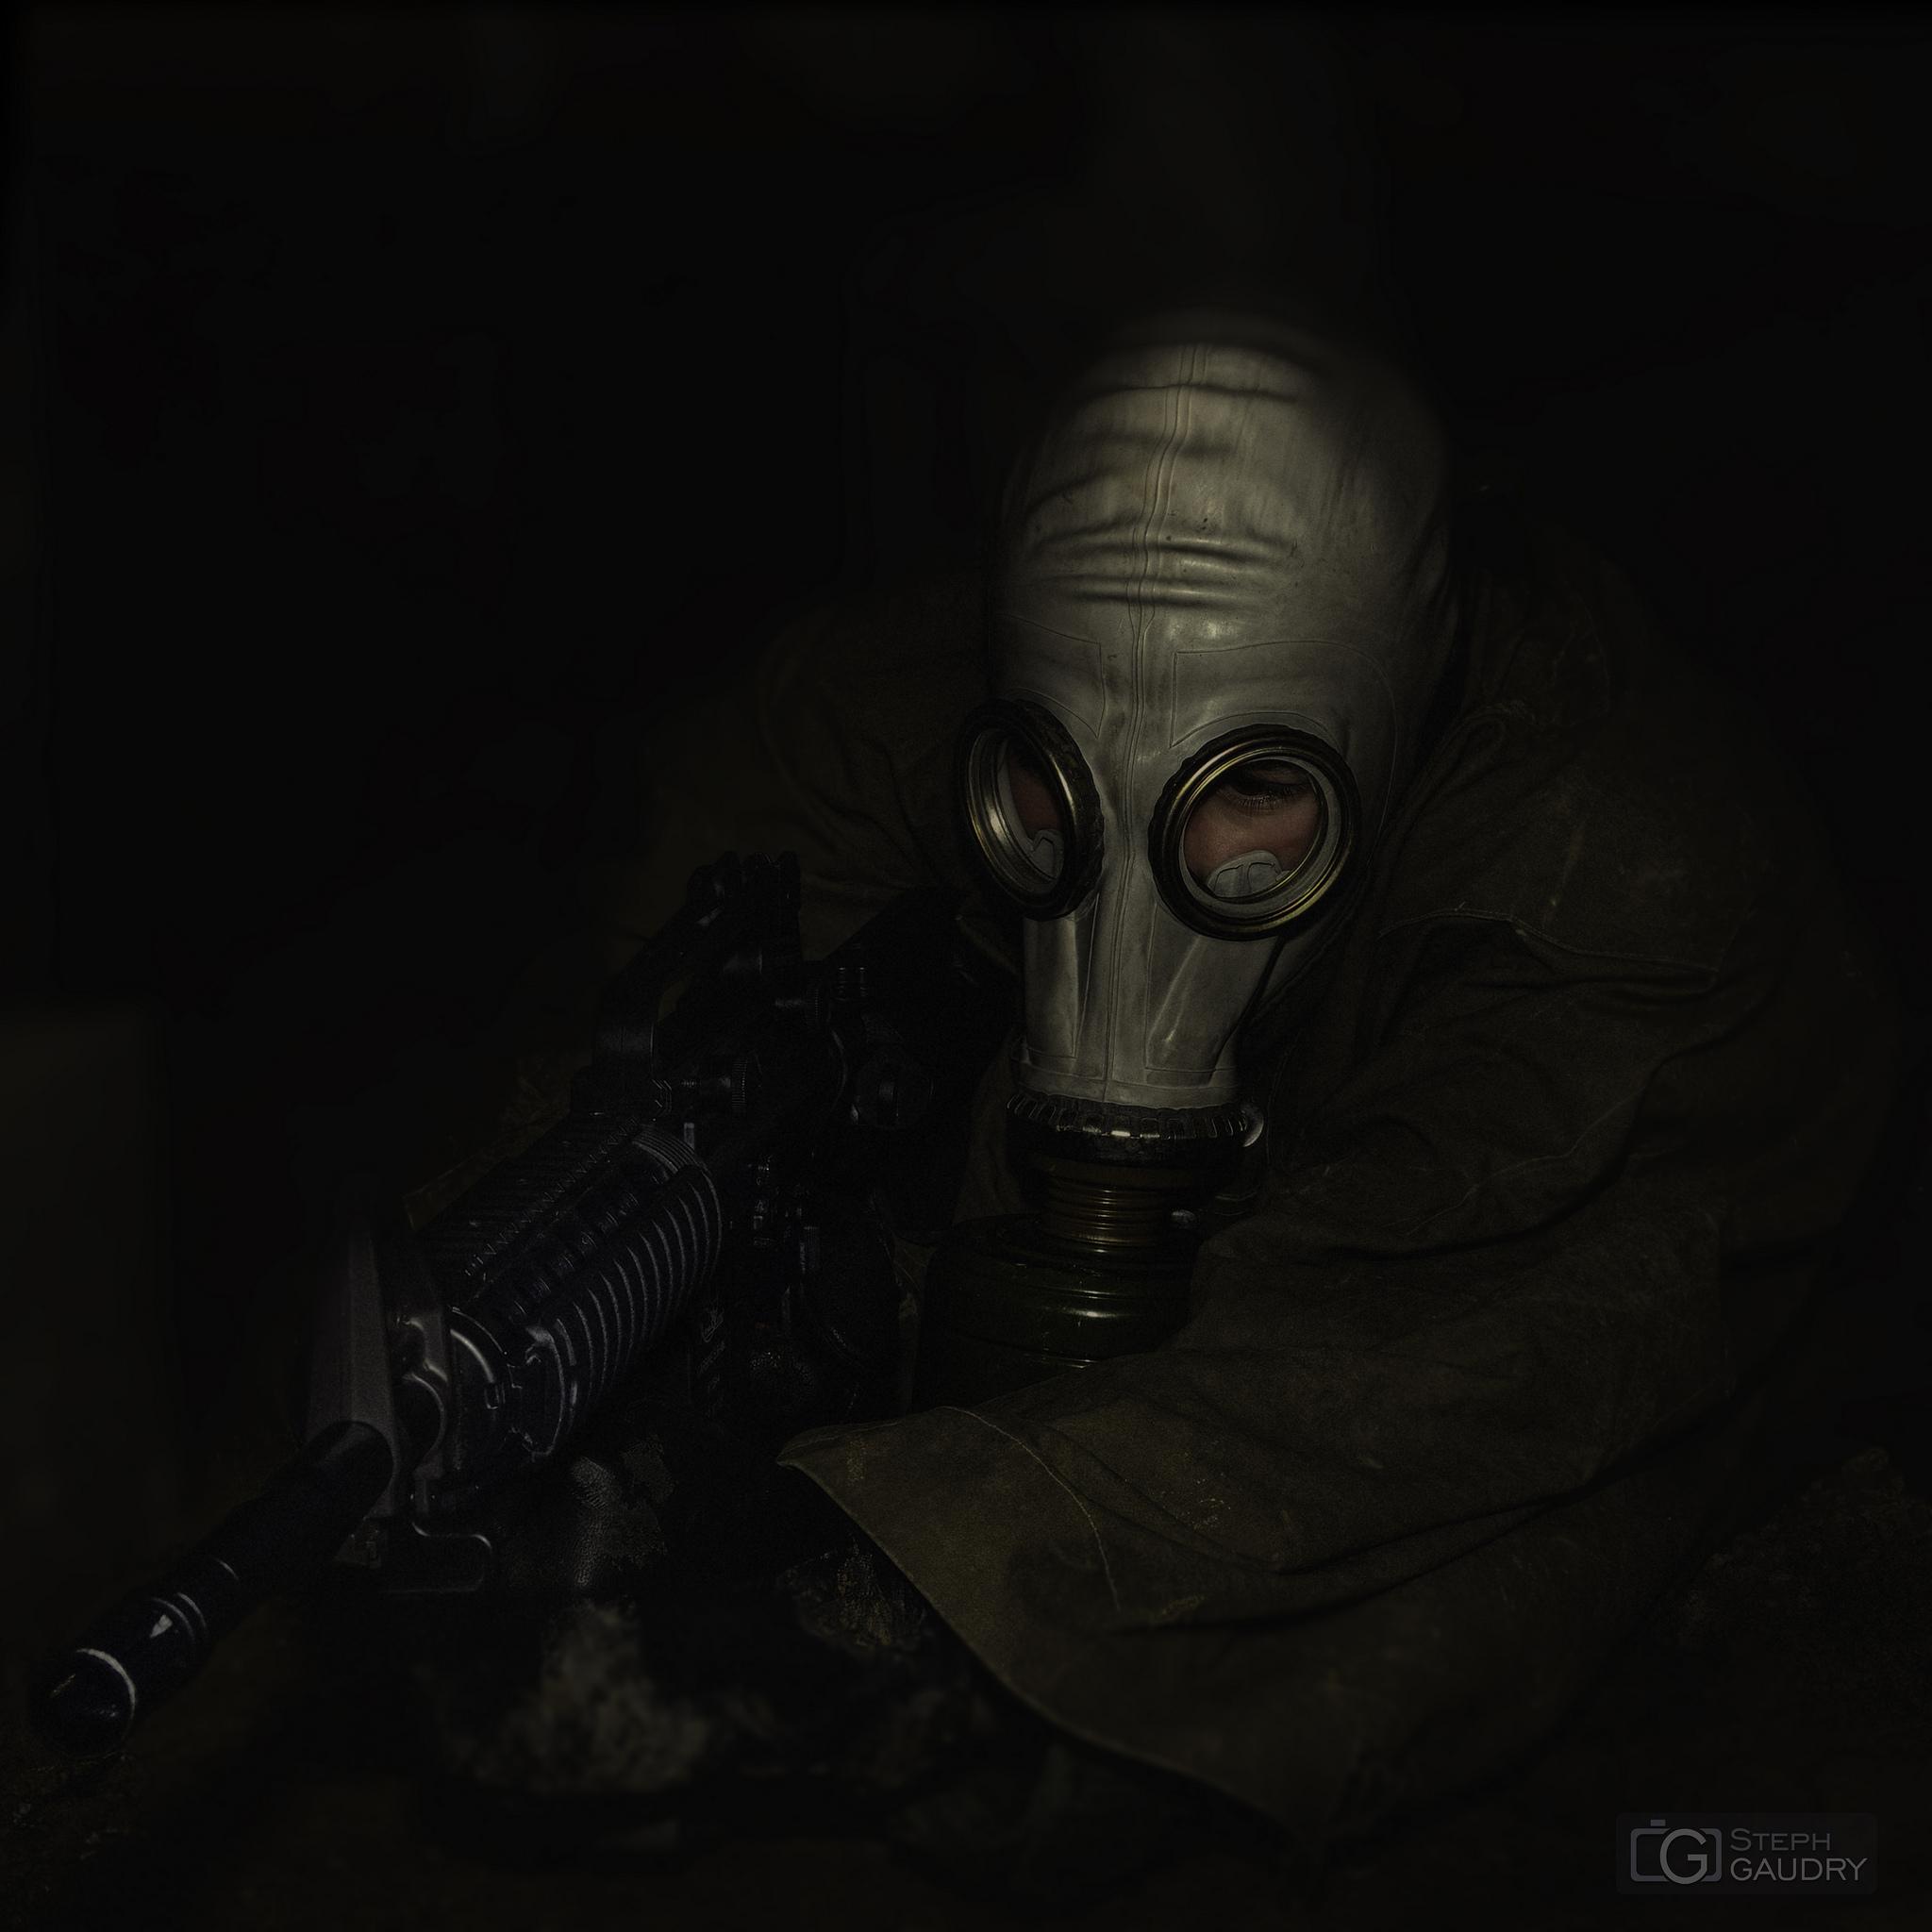 Stalker shadow of chernobyl [Click to start slideshow]